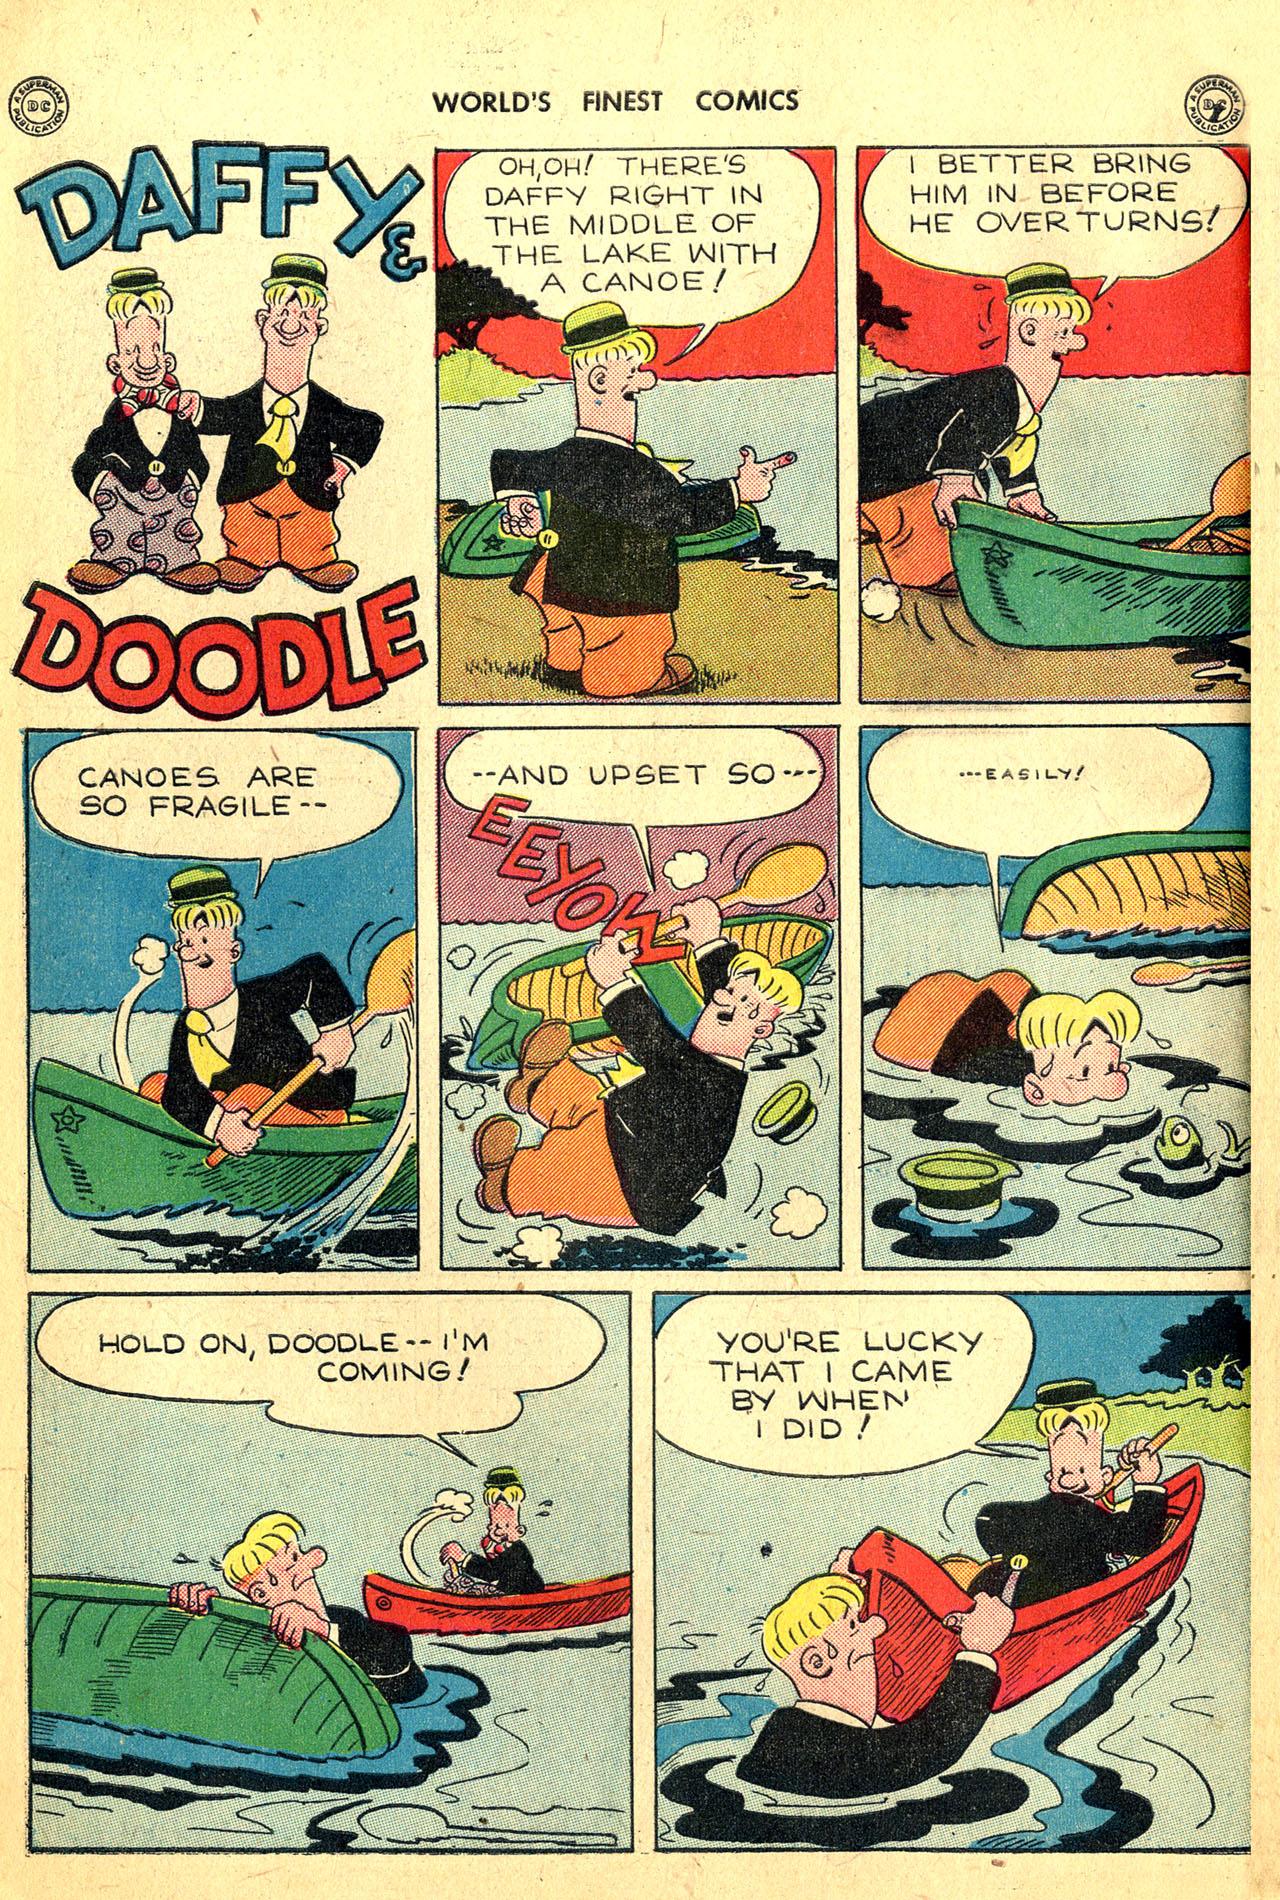 Read online World's Finest Comics comic -  Issue #18 - 34